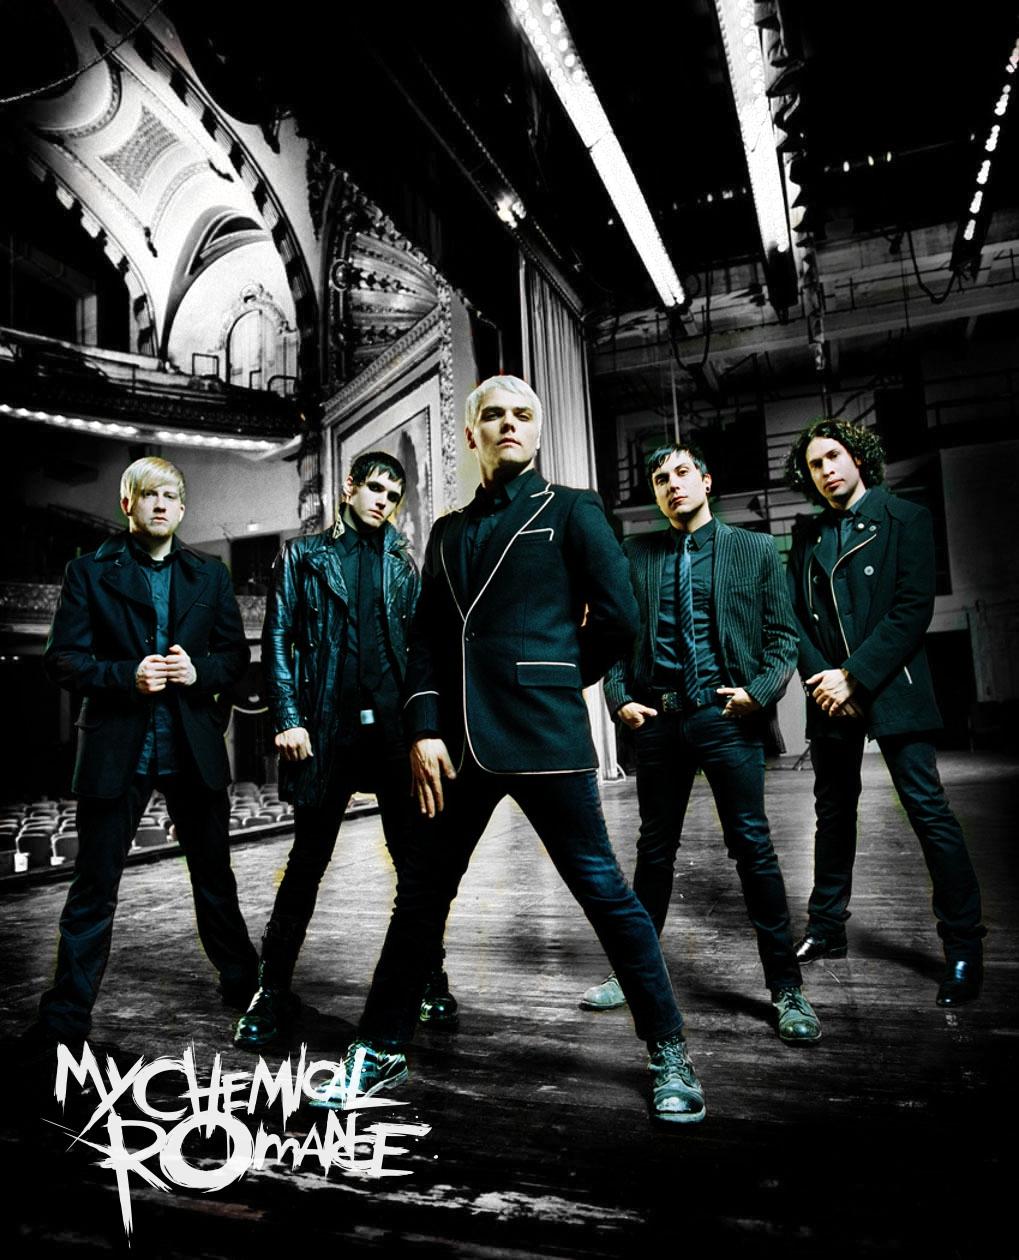 Frank Iero Wallpaper: My Chemical Romance Wallpaper #1301 By GeeWaySavedMe